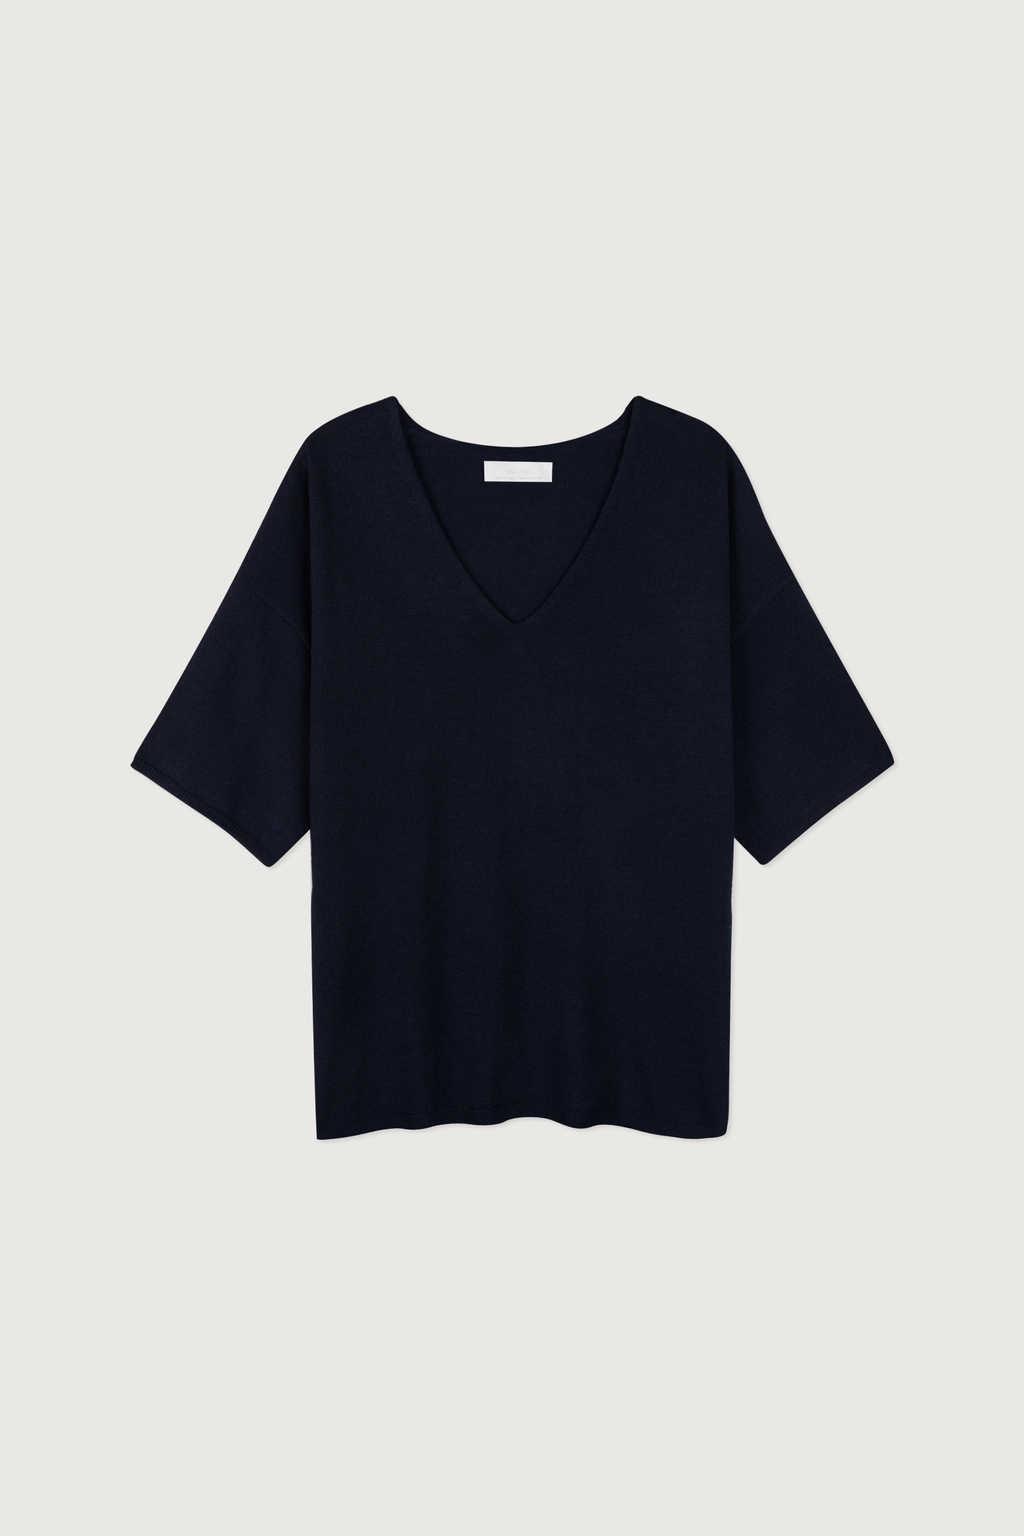 Sweater 3448 Navy 7